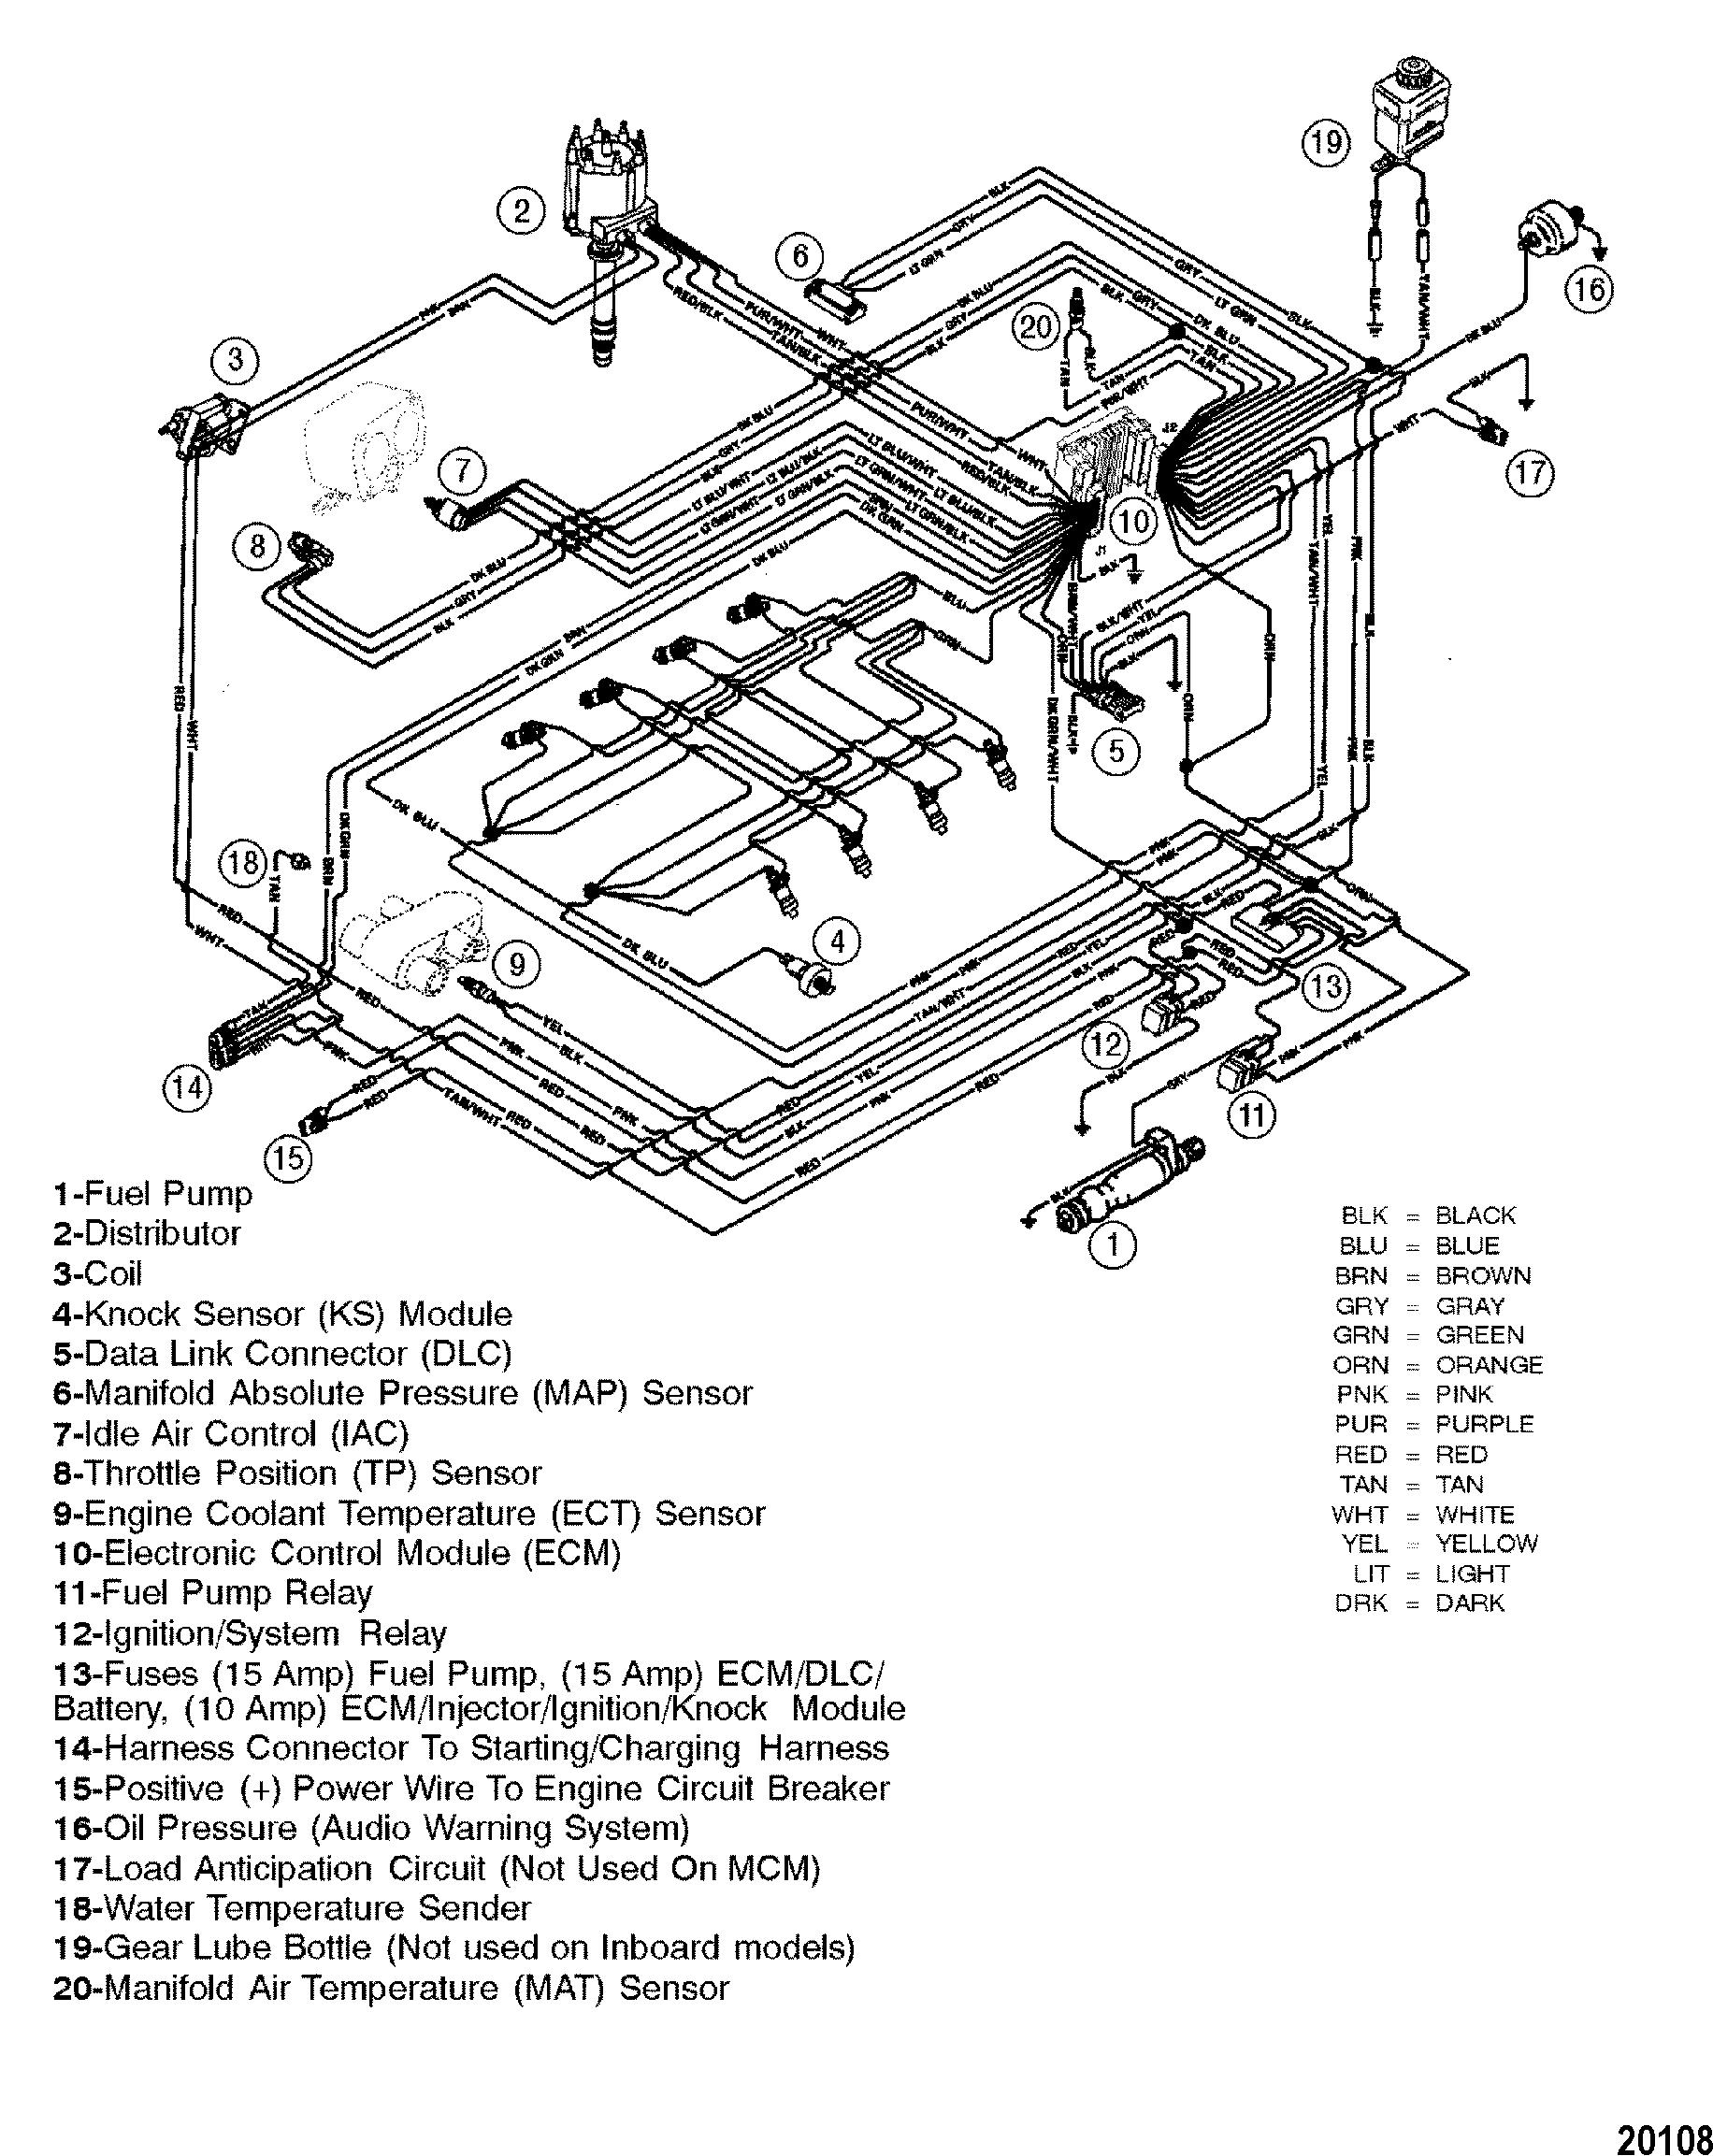 Mercruiser Wiring Diagram 5 7 - Great Installation Of Wiring Diagram • - Mercruiser 5.7 Wiring Diagram